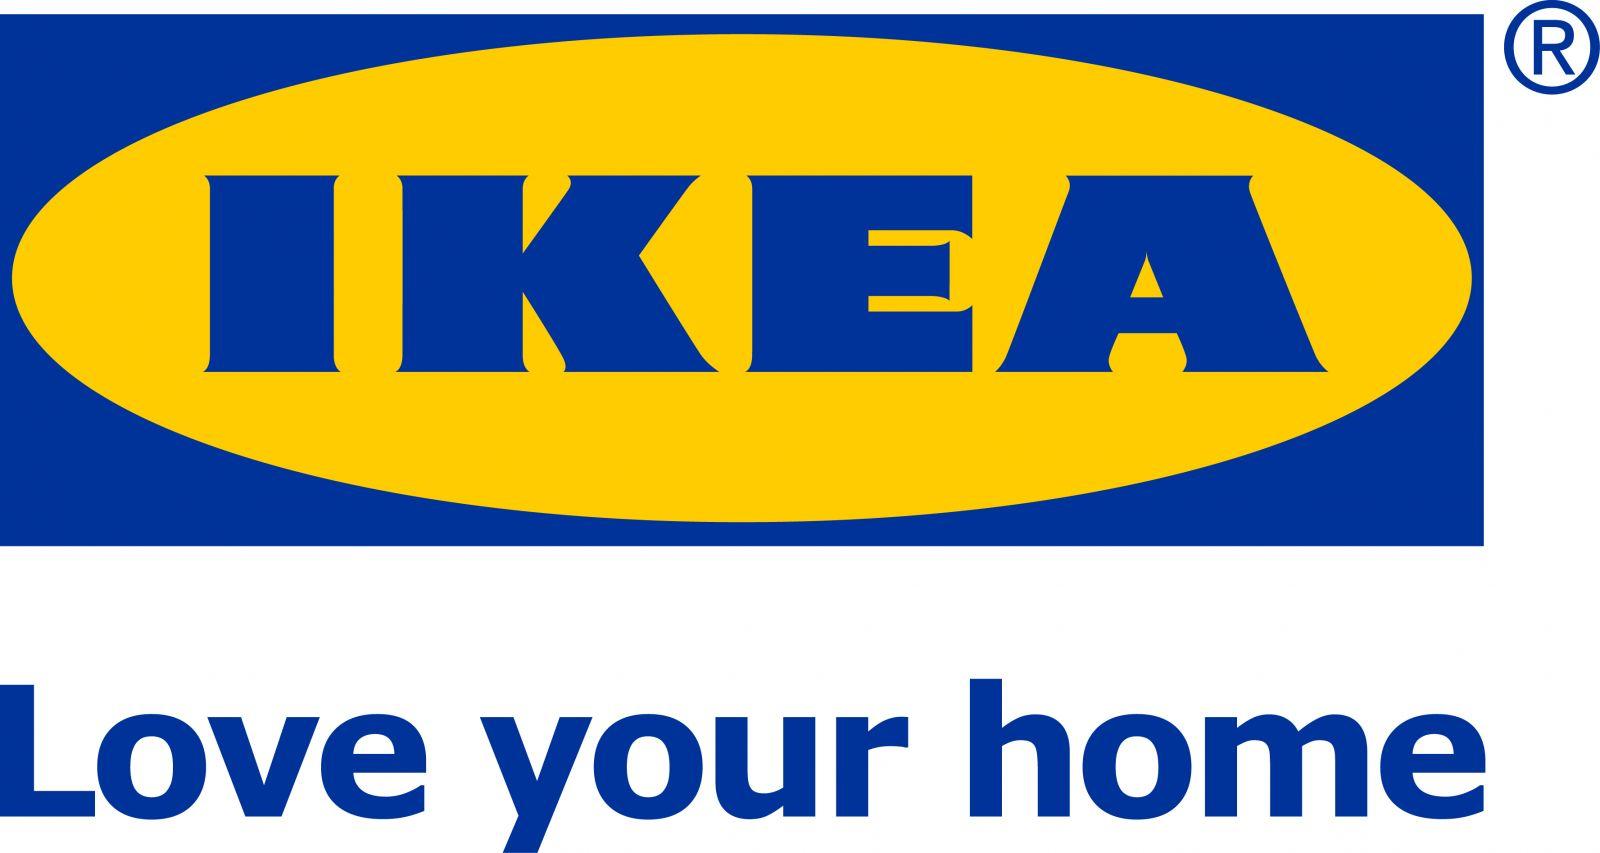 شعار شركة ايكيا IKEA logo png PlusPng.com  - Ikea Logo Eps PNG